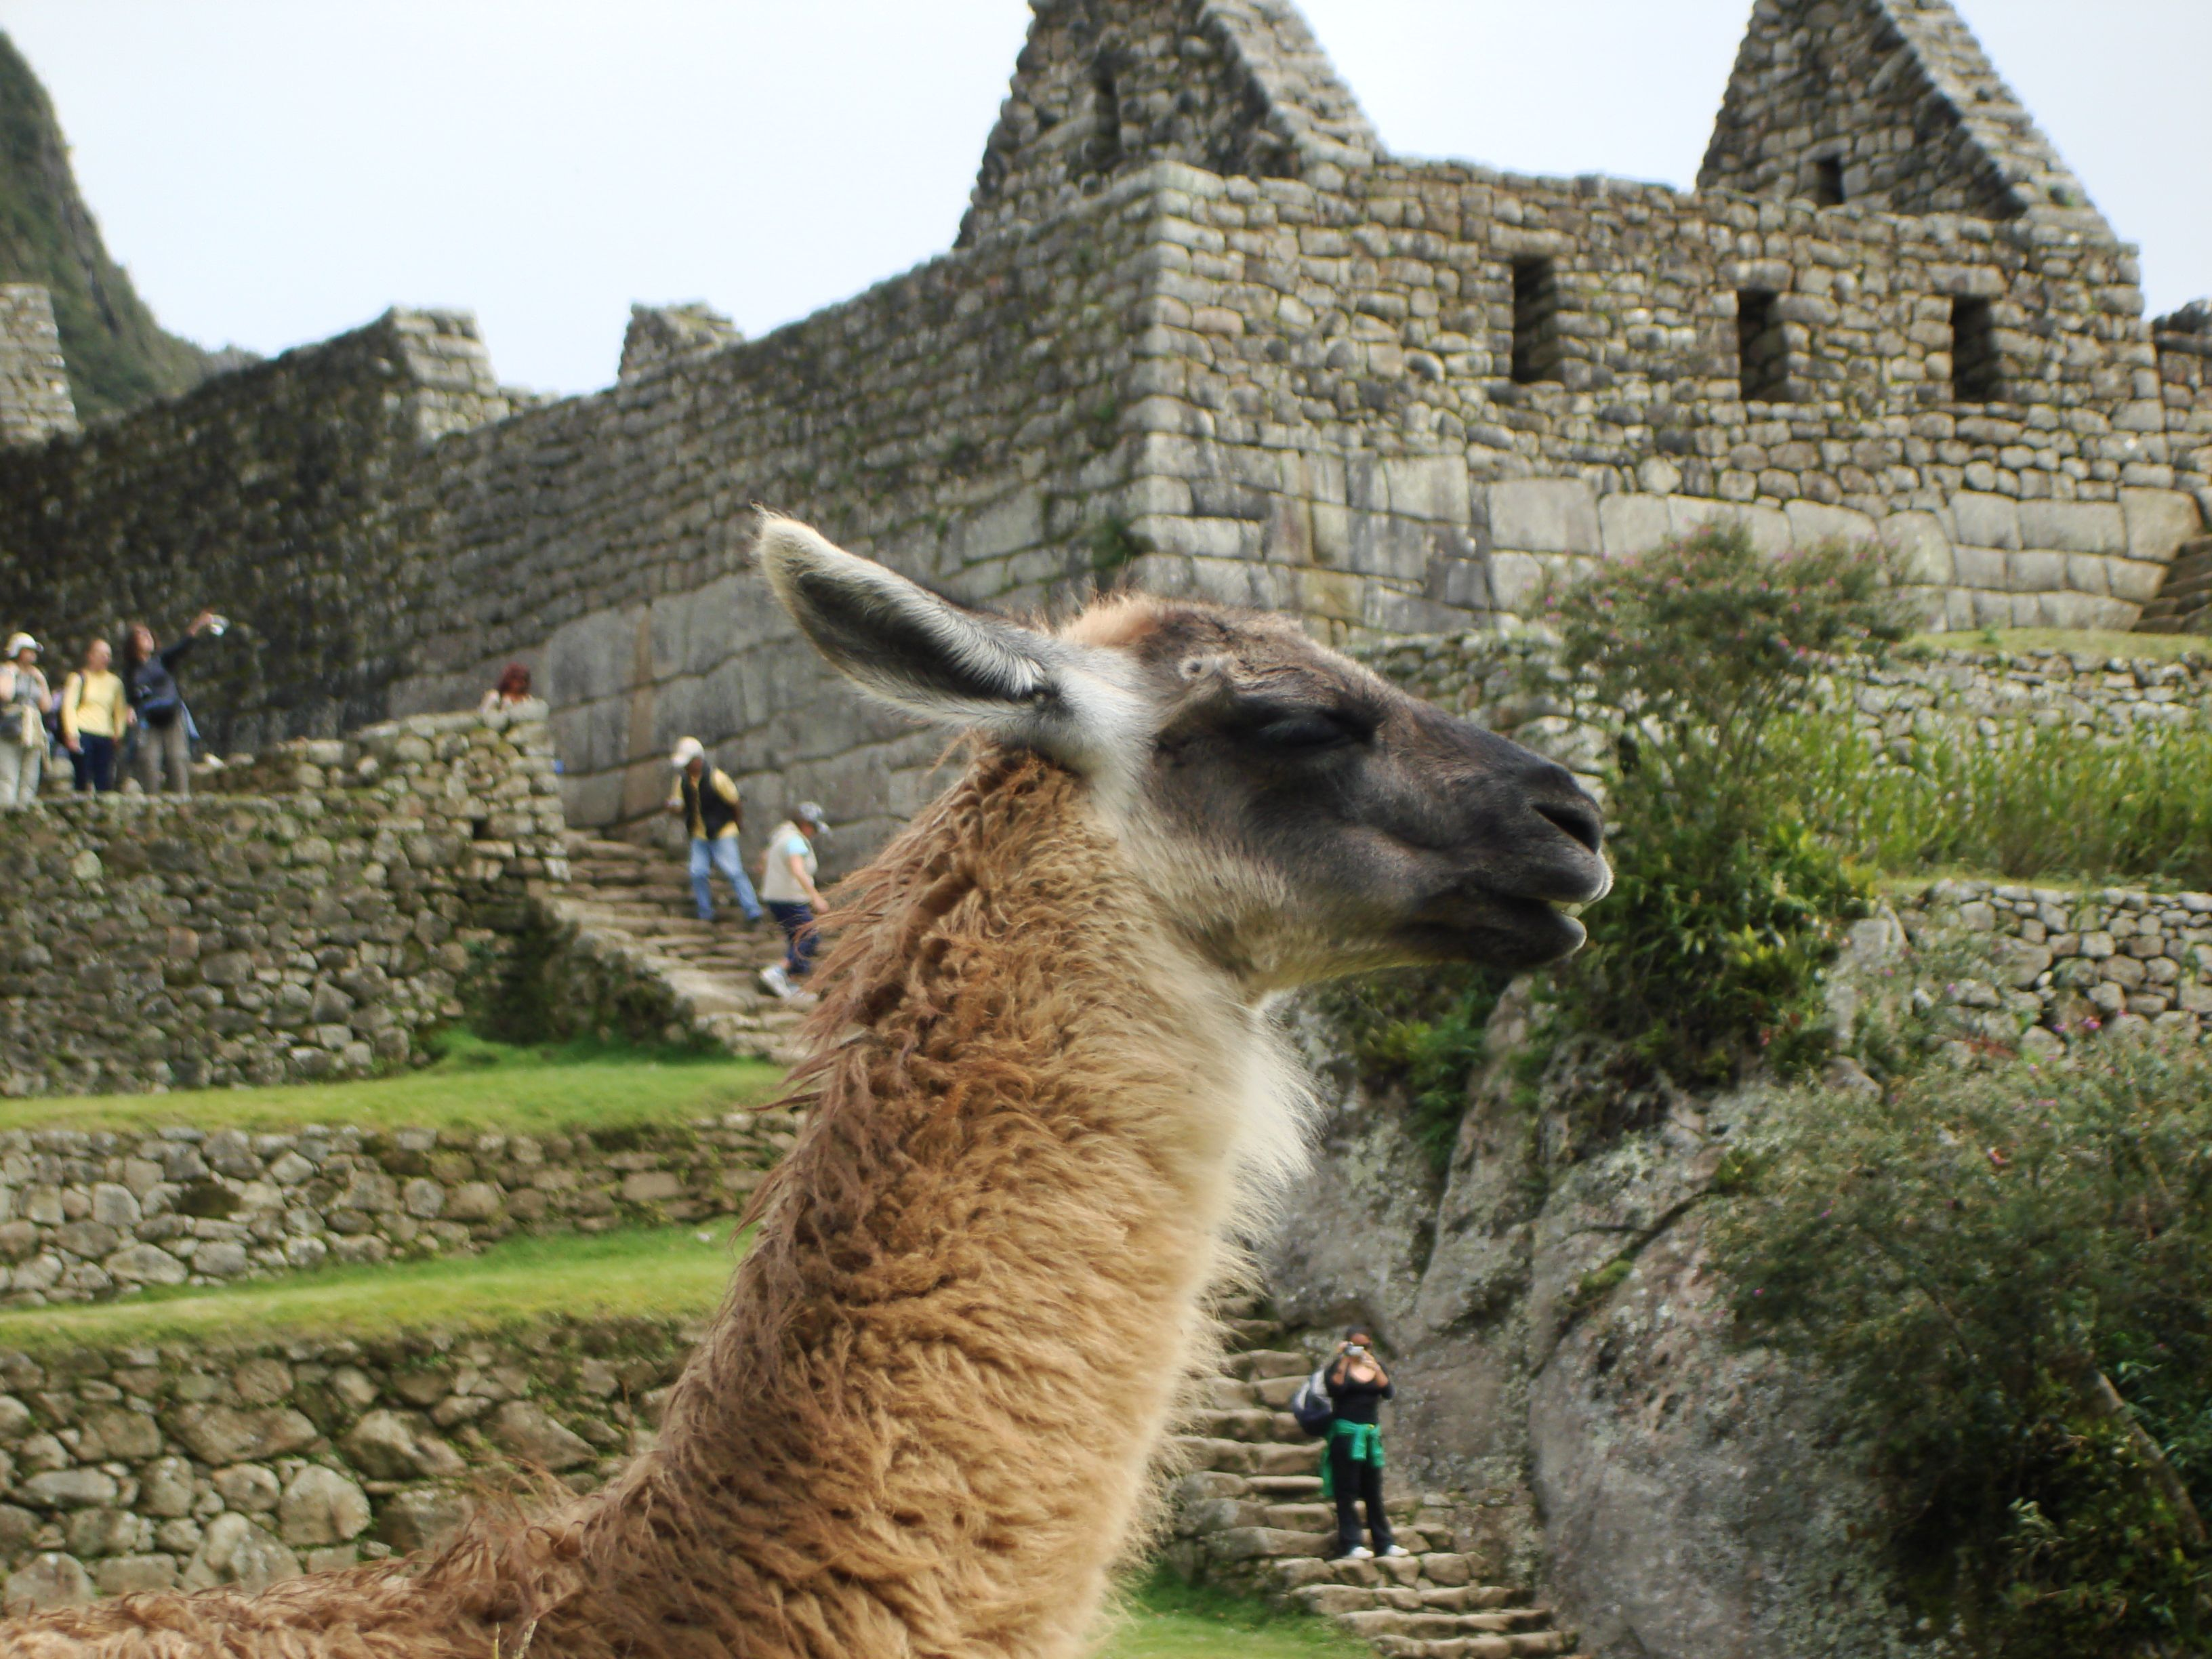 Lama at Machu Picchu